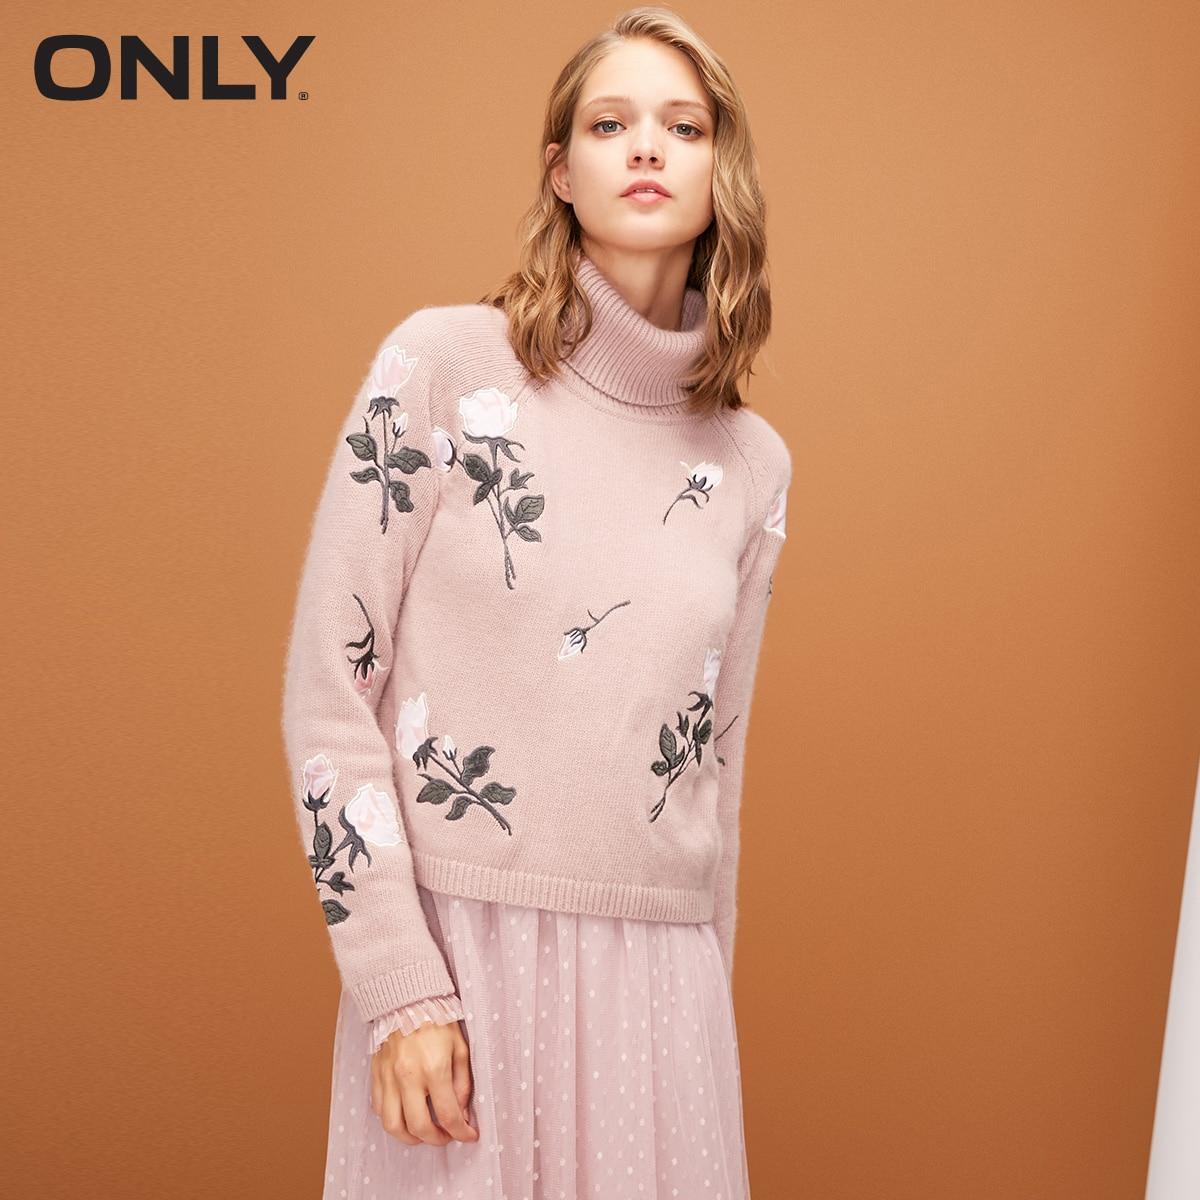 ONLY 2019 Women Autumn New High Collar Print Slim Sweater    |  118313563